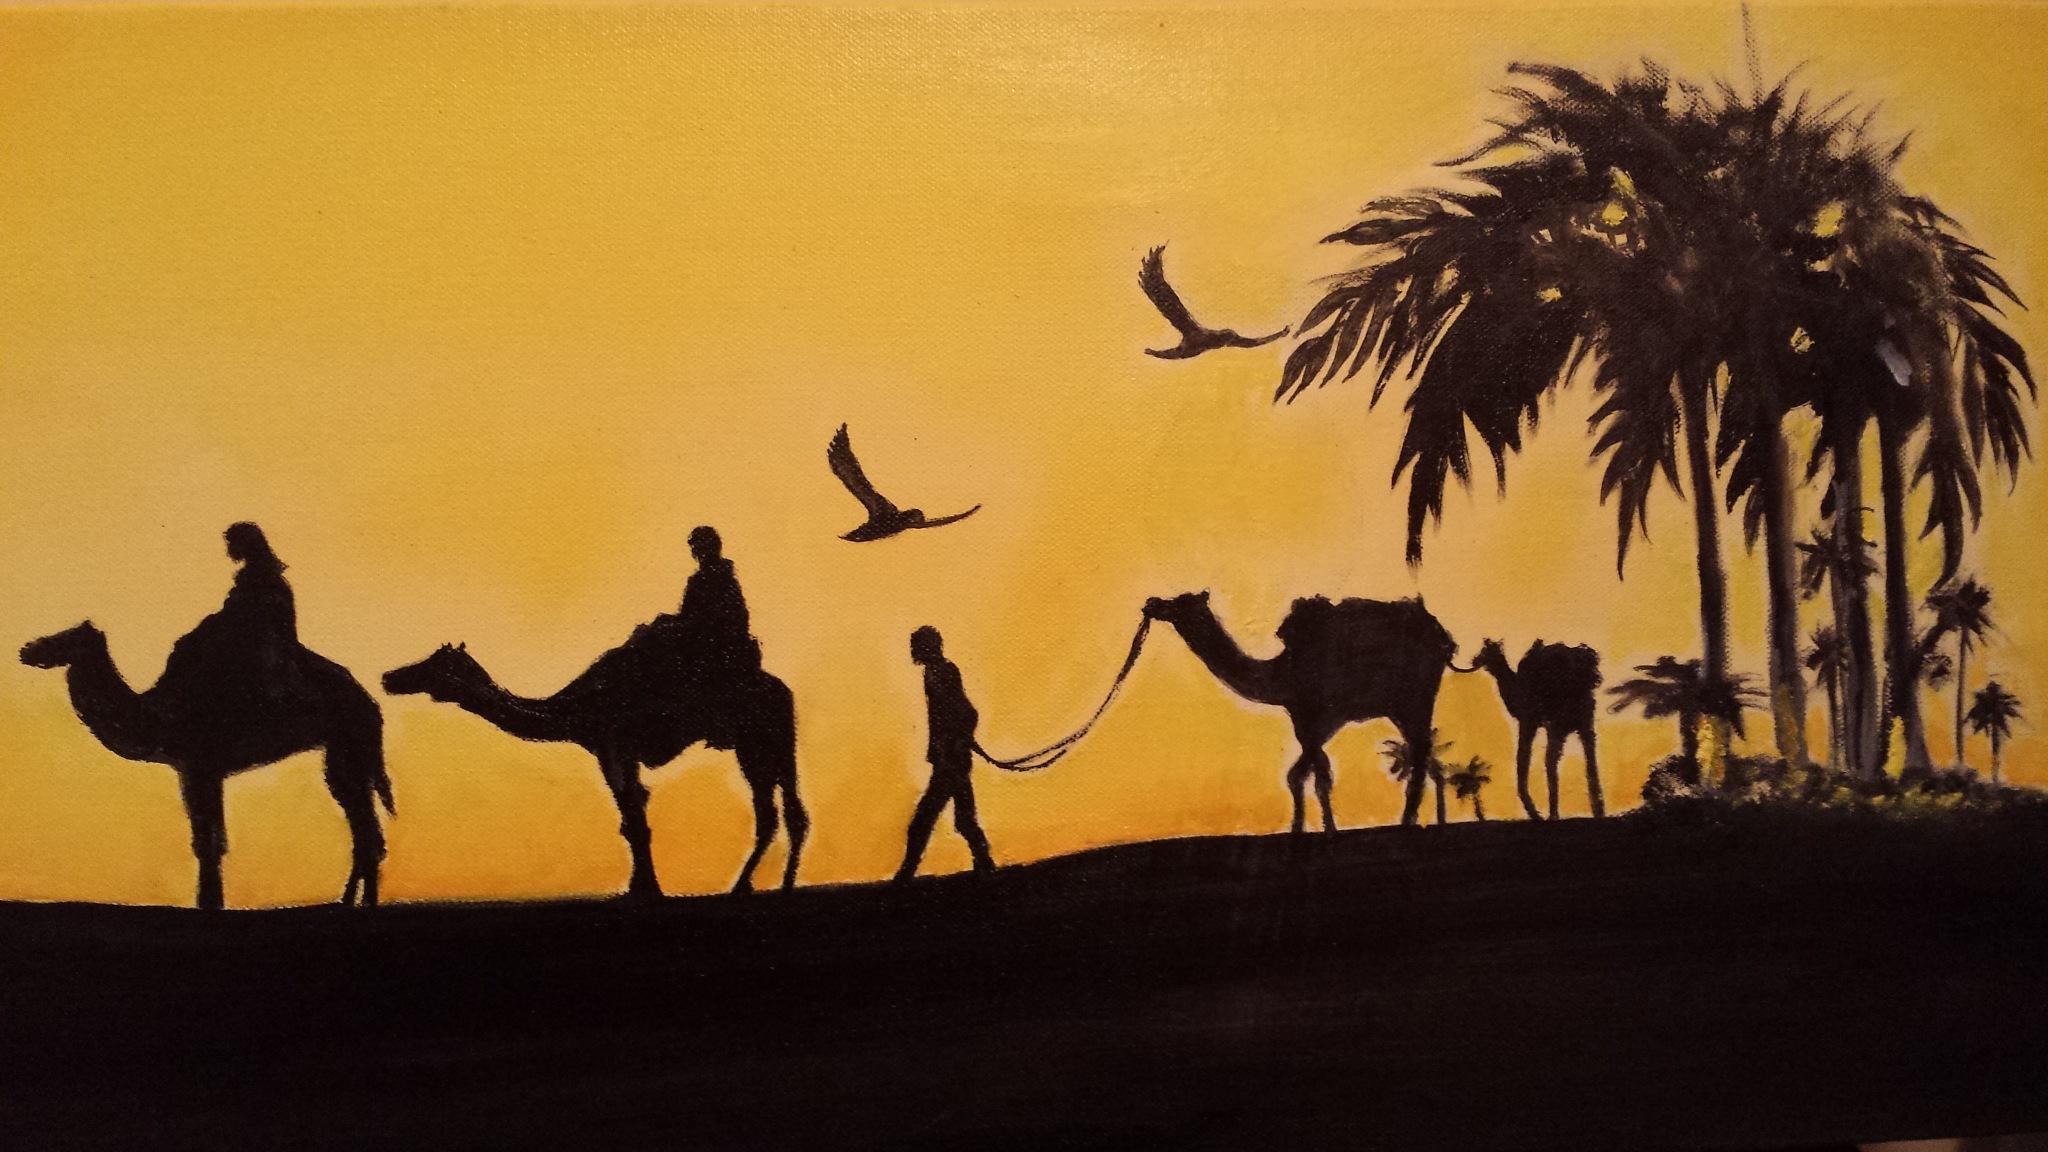 the caravan  by Mehdi Ammani